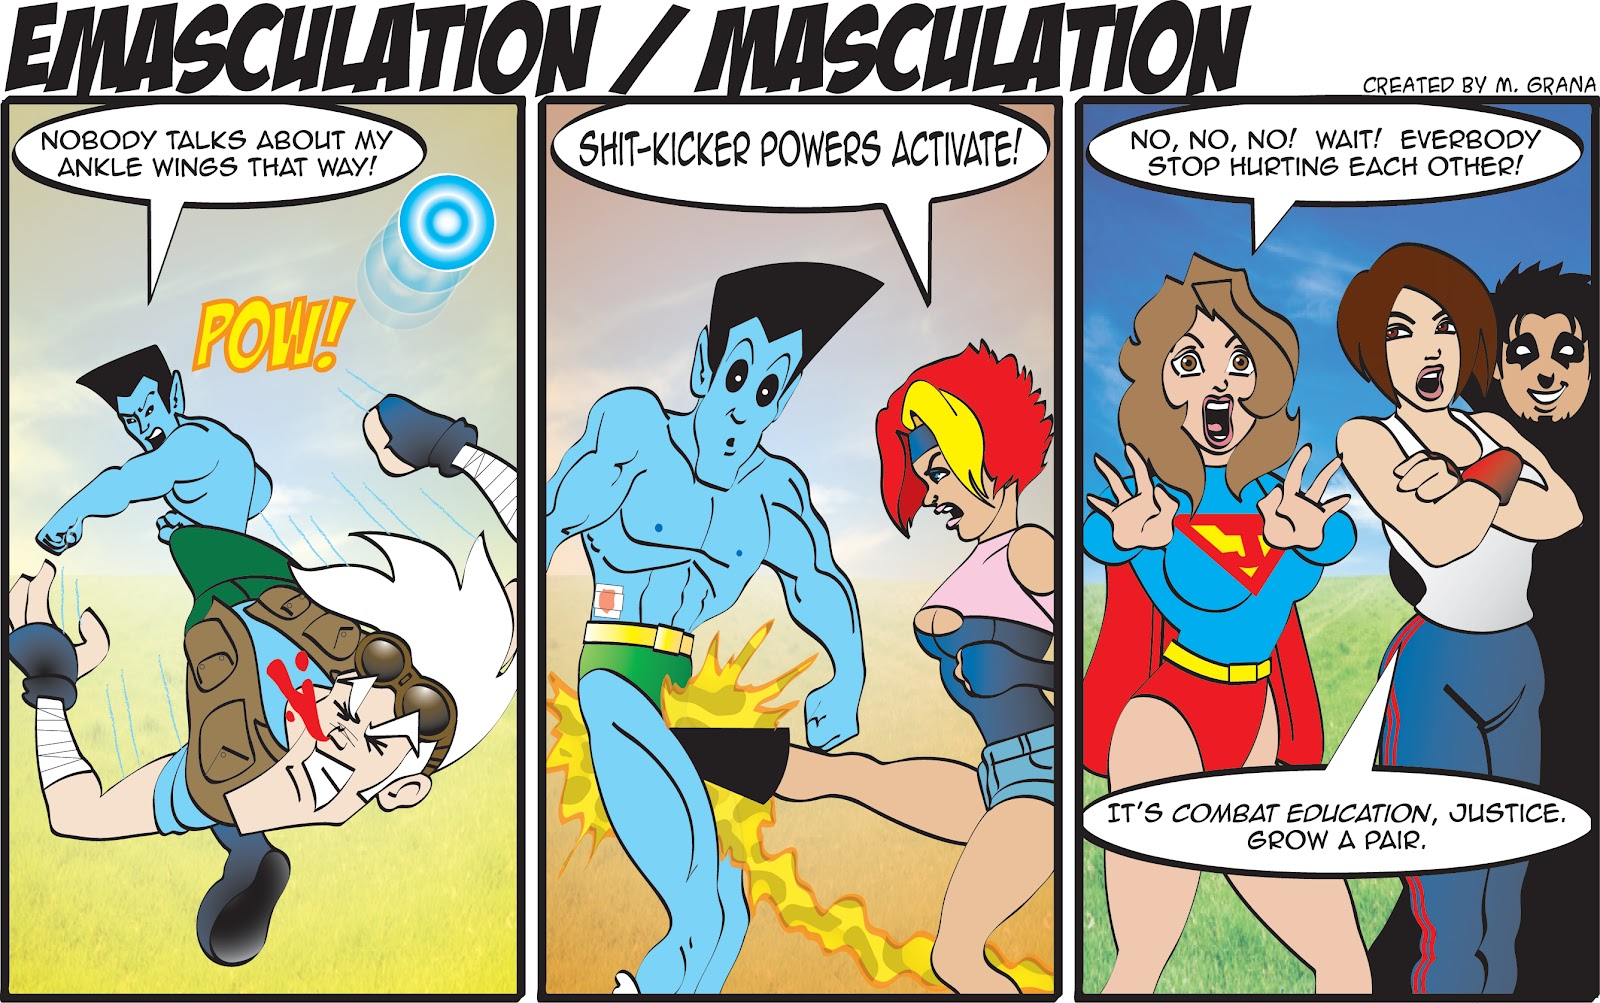 Super U.: Emasculation / Masculation